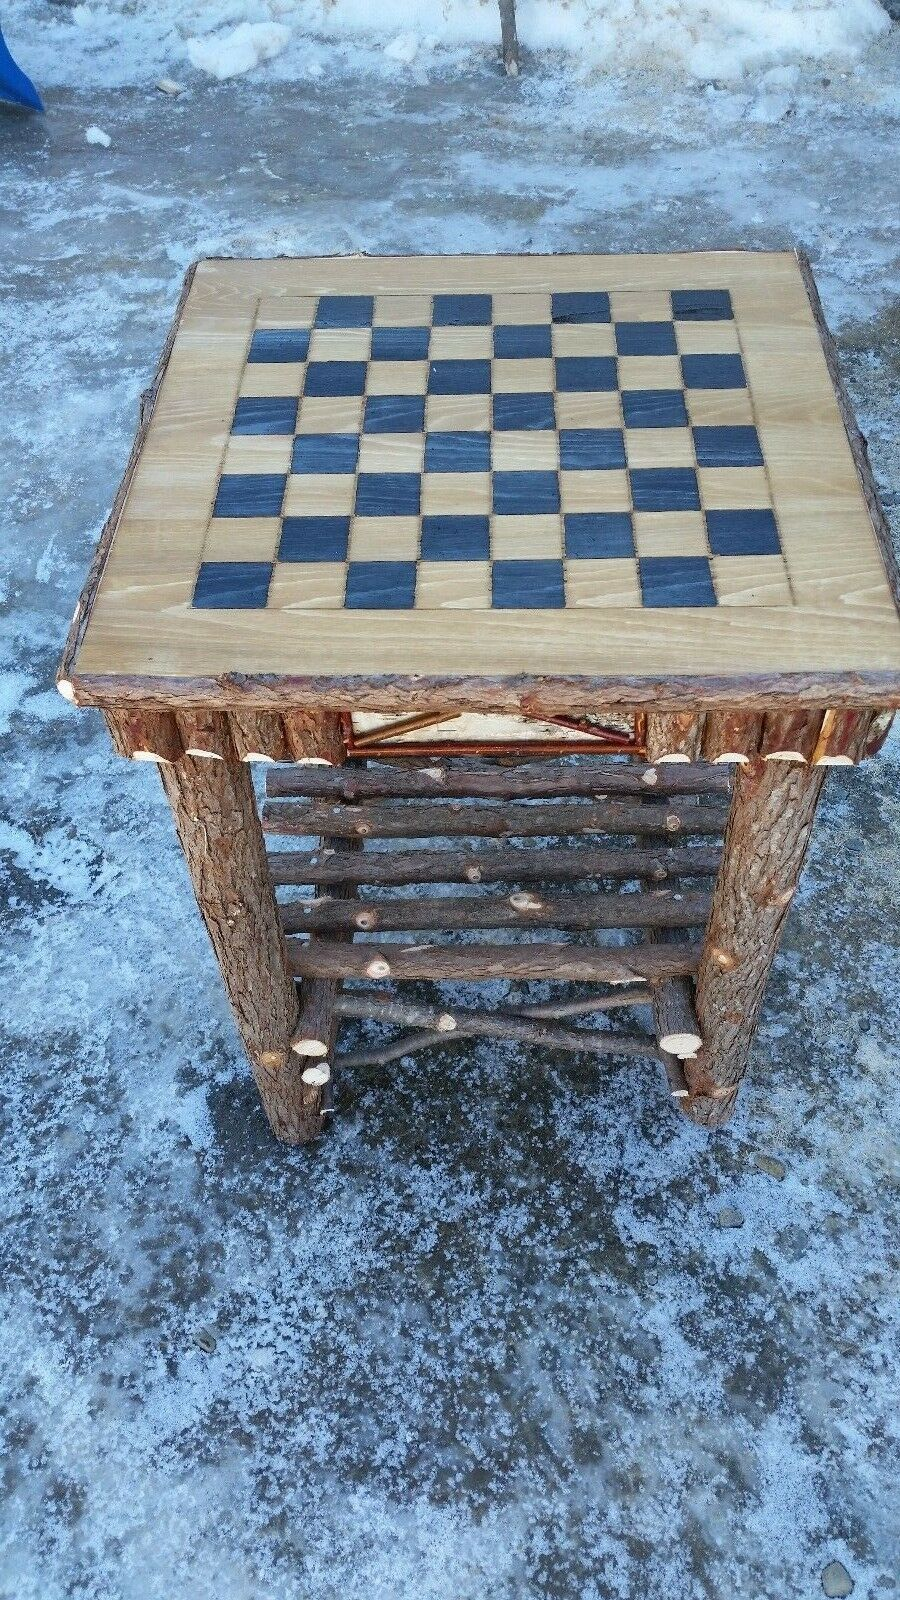 Twig Furniturerustic Cedarbirch Barkchecker Board Tablechess 20 X 20x 28 Rustic Table Ideas Of Rustic Table In 2020 Twig Furniture Rustic Table Checkerboard Table